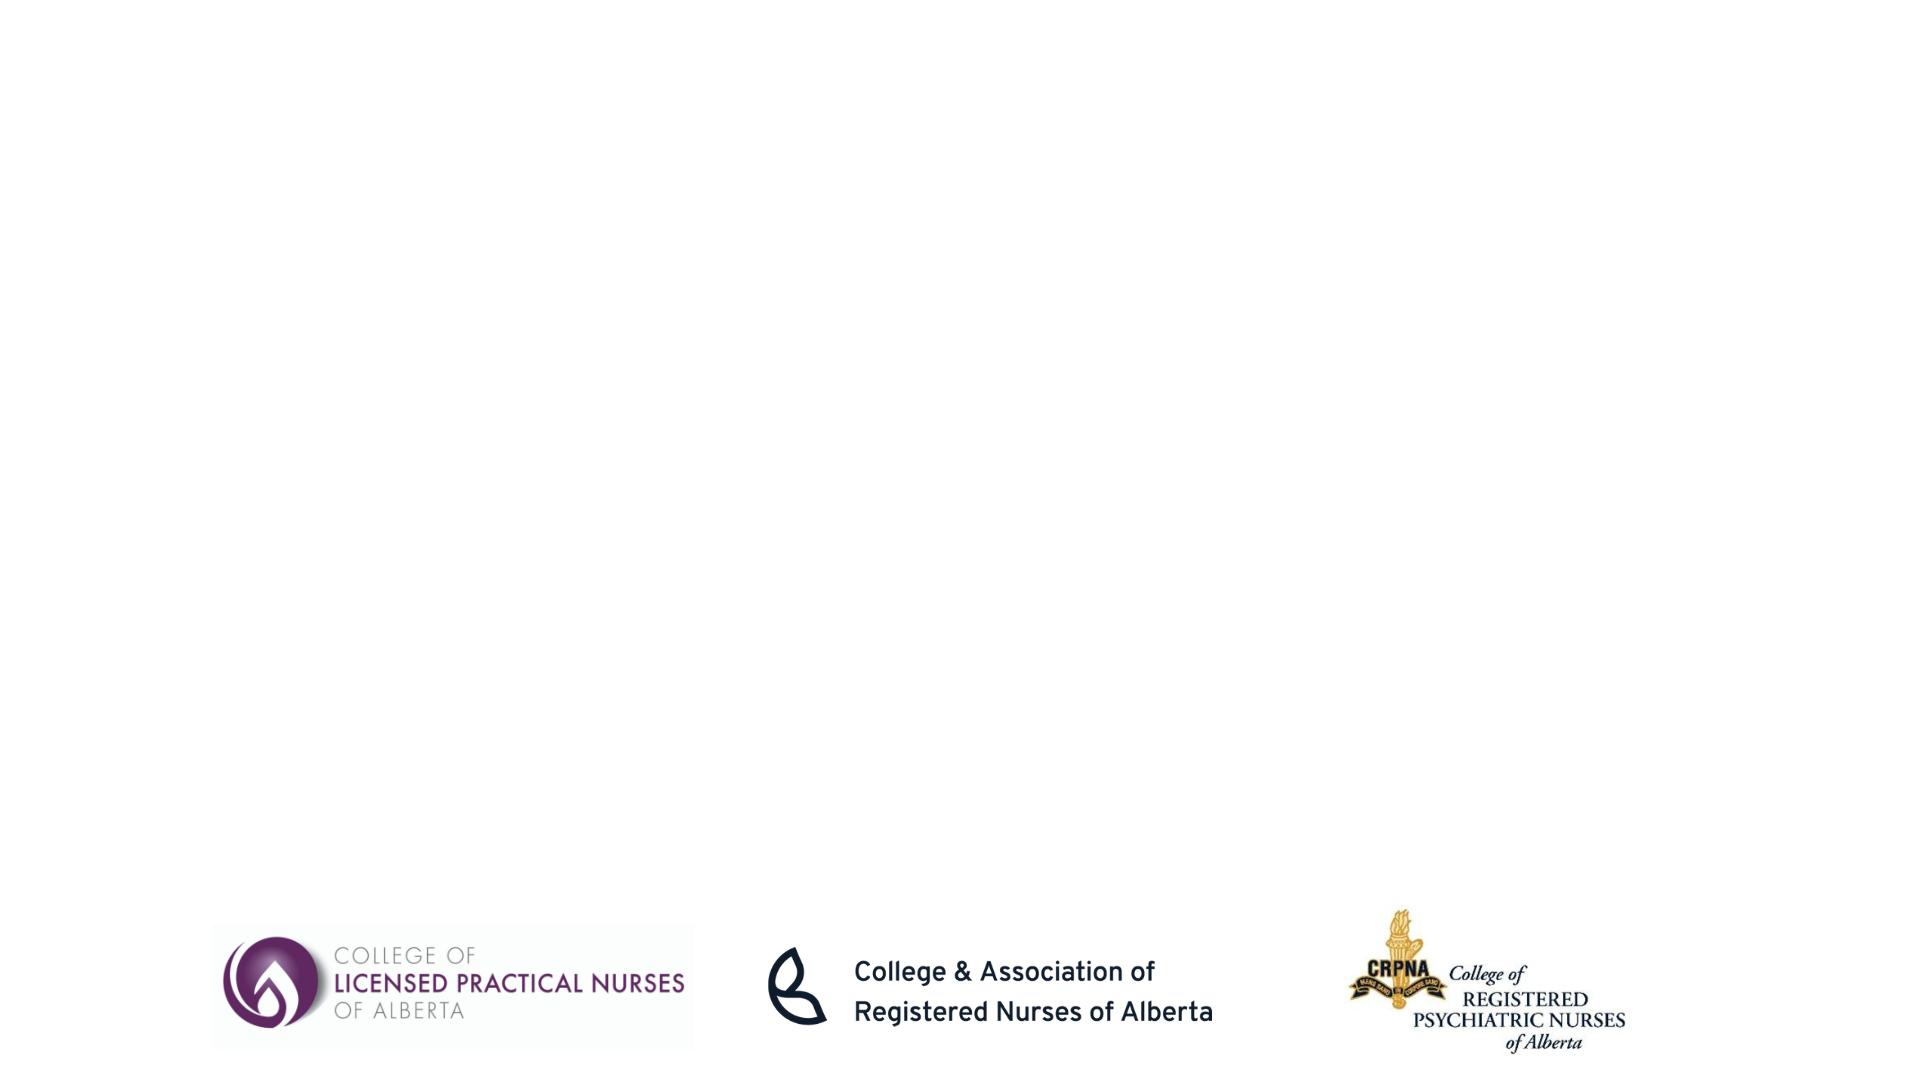 CARNA-CRPNA-CLPNA-Logo-Tri-Nursing-Logo_600x100